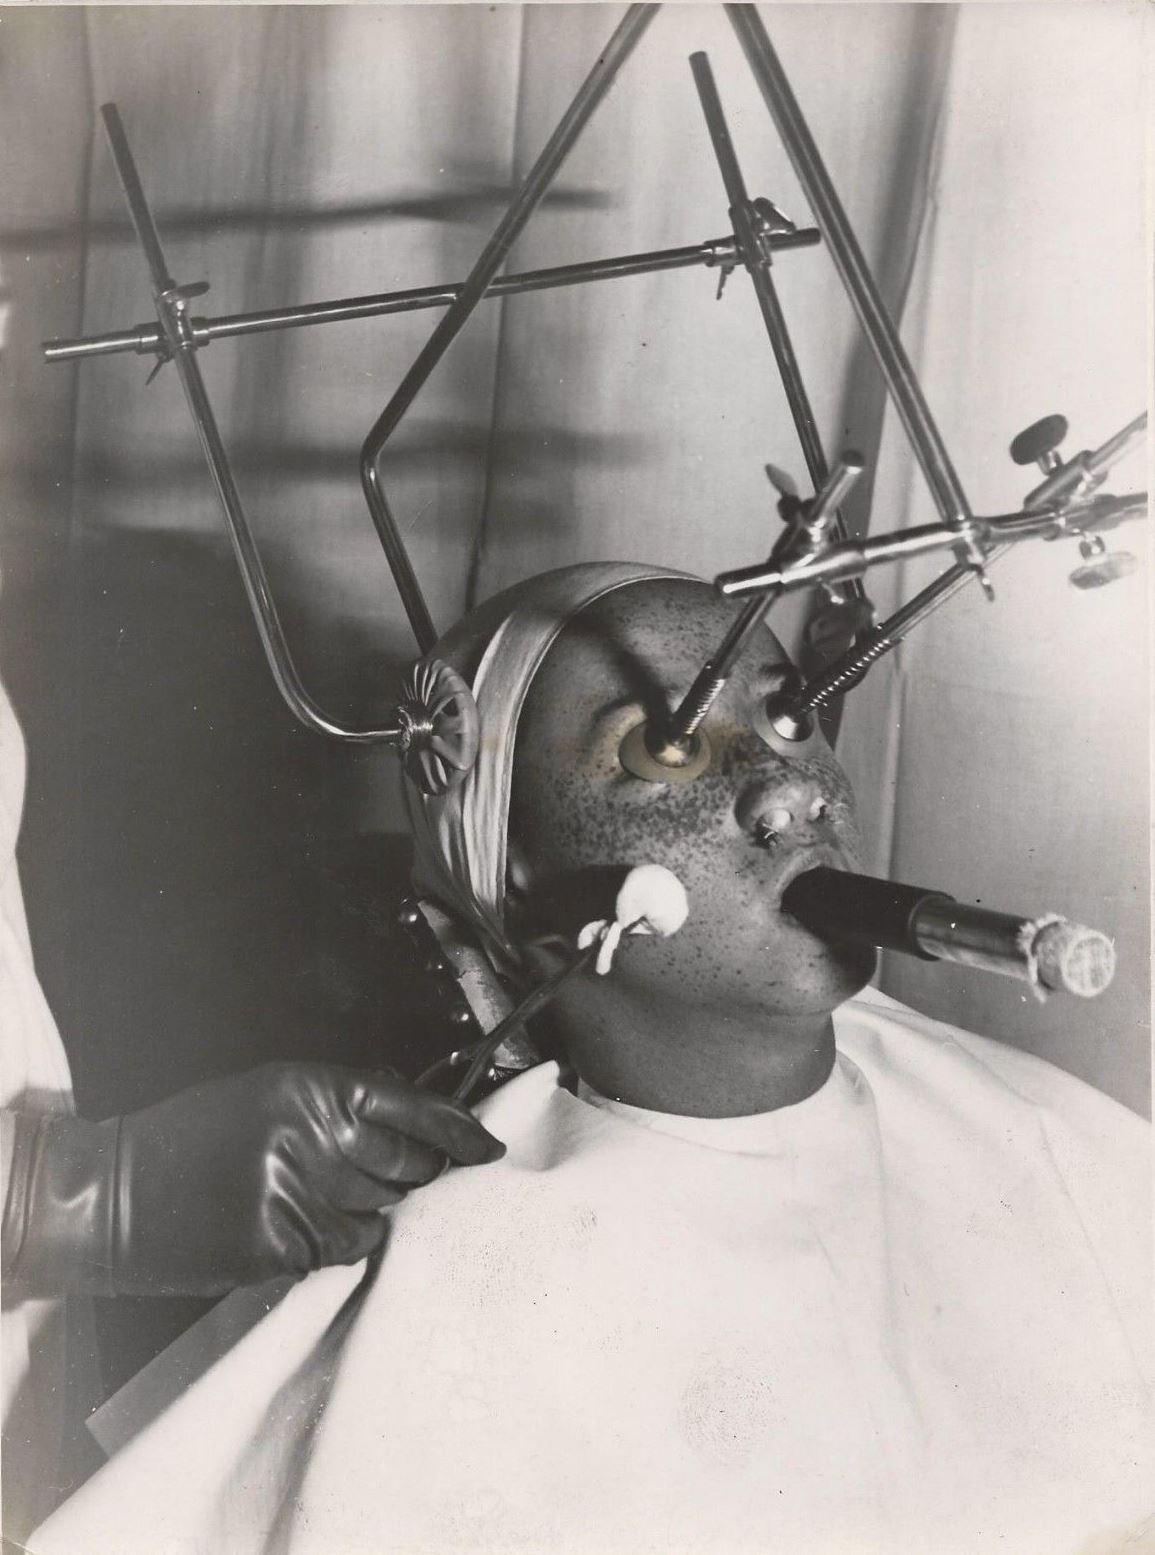 Photographe inconnu. Hungary Electroschock Psychiatry 1930. Via ebay